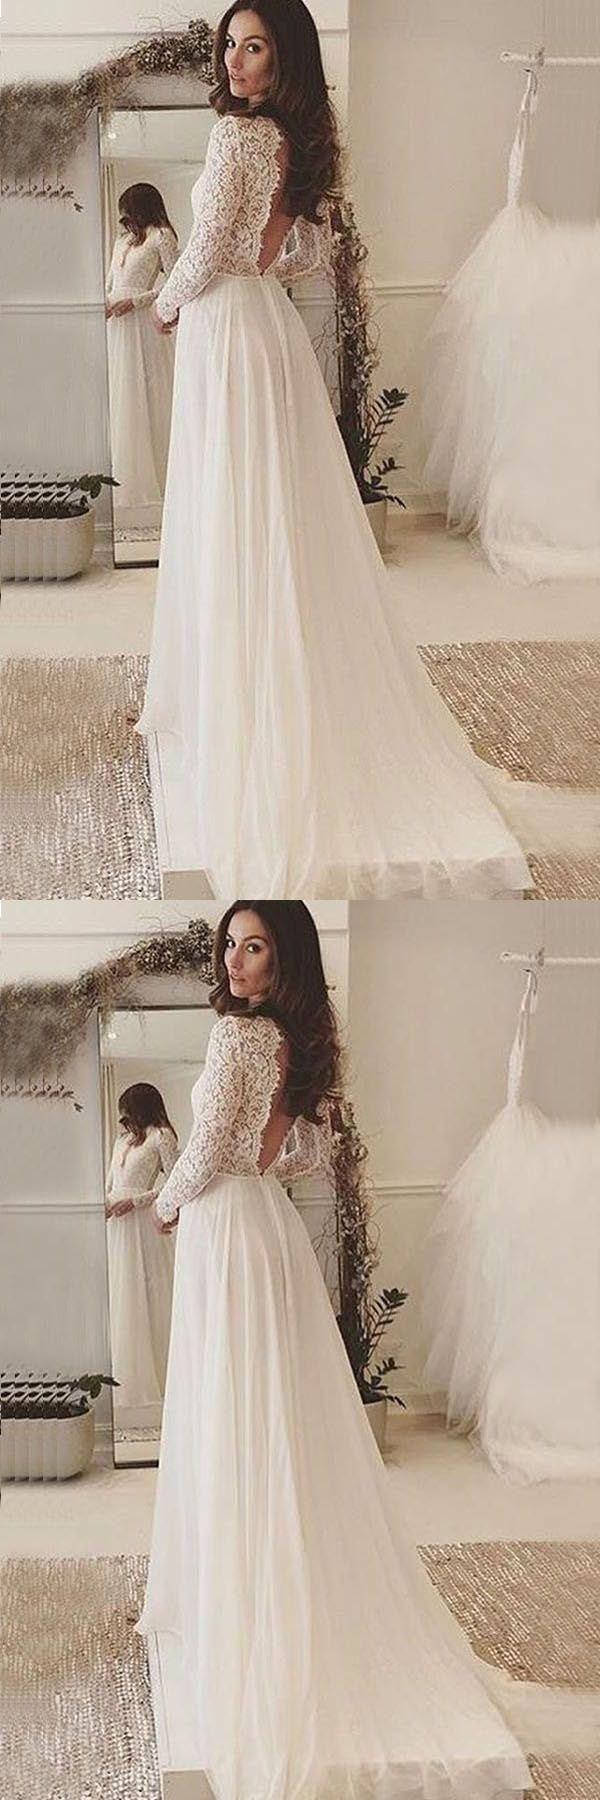 Lace v neck wedding dress  Wedding Dresses  Ivory Wedding Dress V Neck Wedding Dress